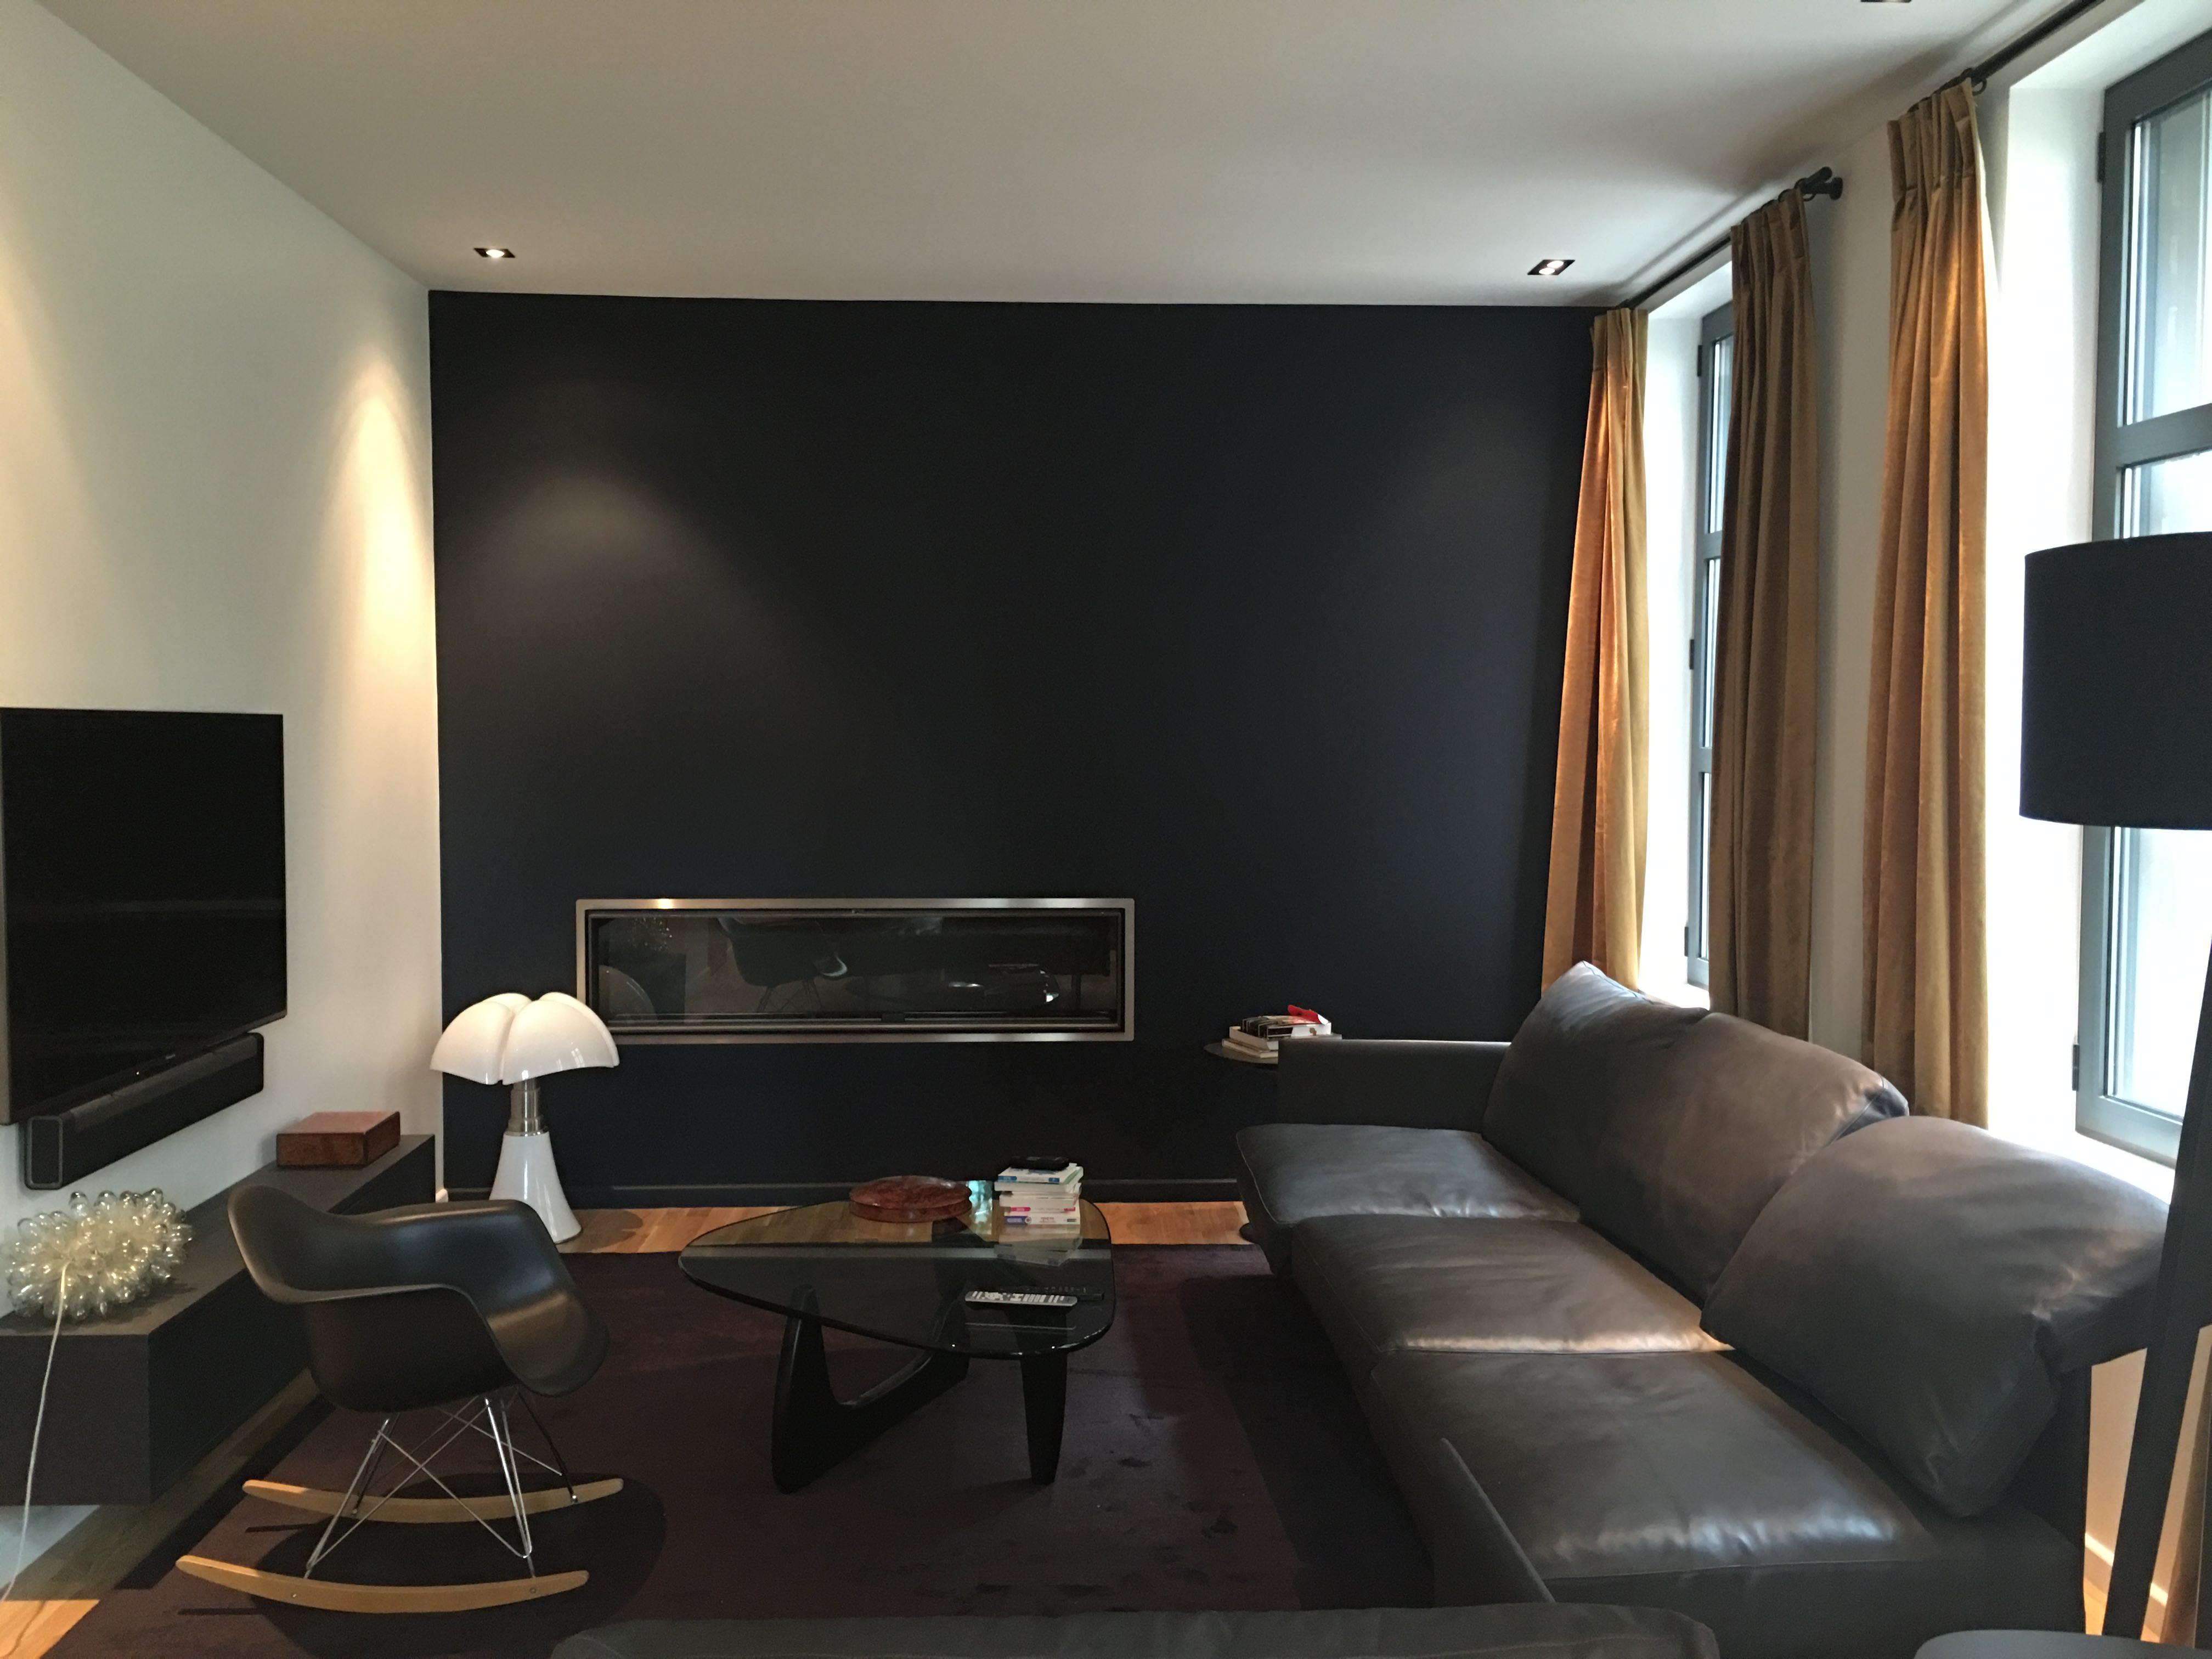 decoratrice interieur rouen decoratrice interieur rouen architecte d interieur rouen et d. Black Bedroom Furniture Sets. Home Design Ideas